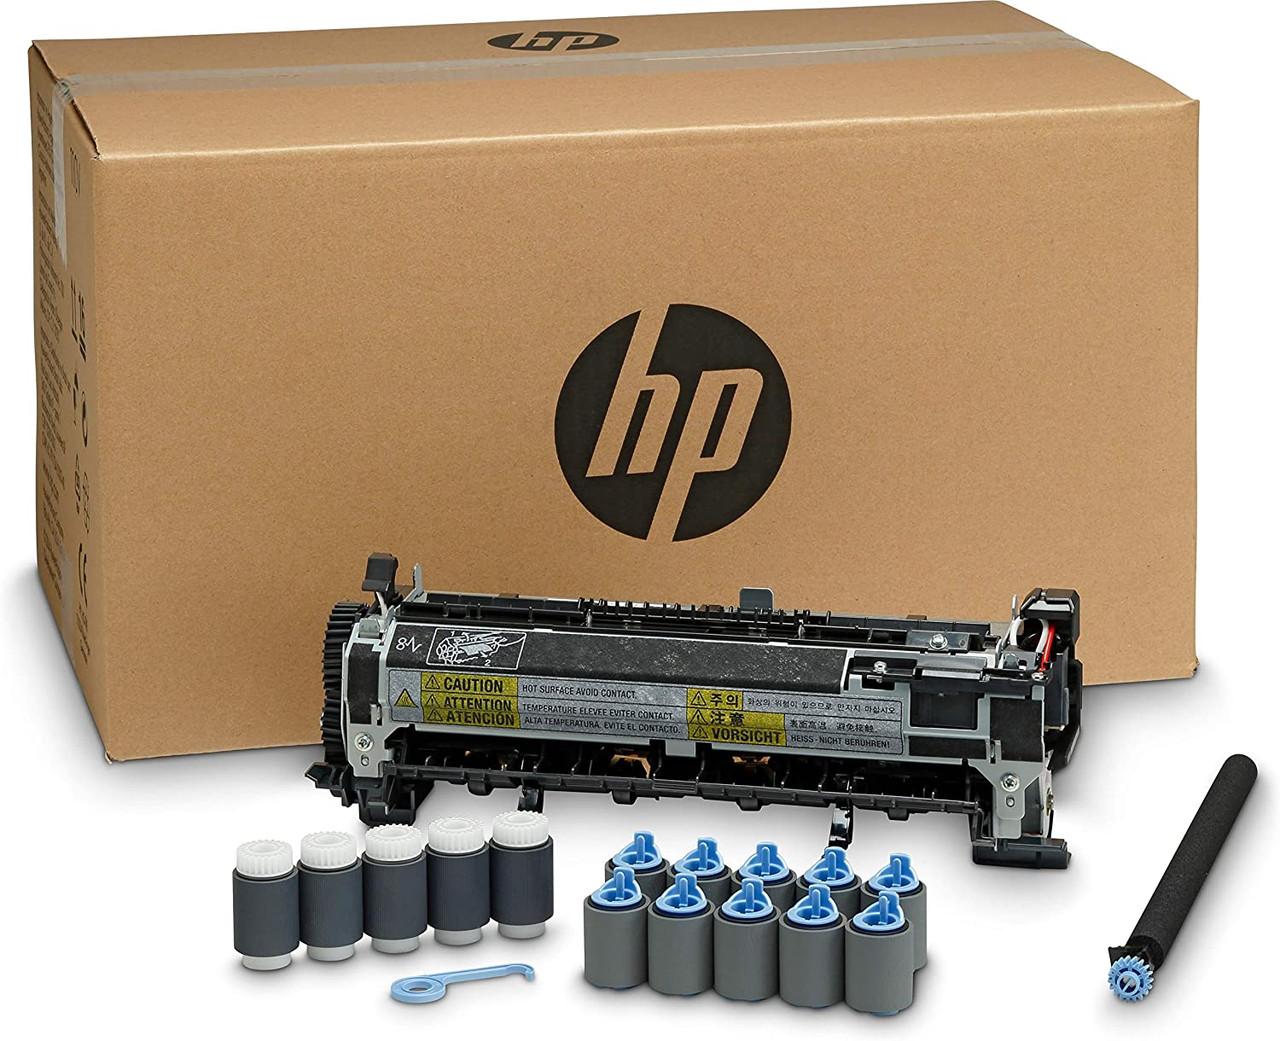 OEM HP Fuser 110V  - Enterprise 604 / M605 / M606 Series